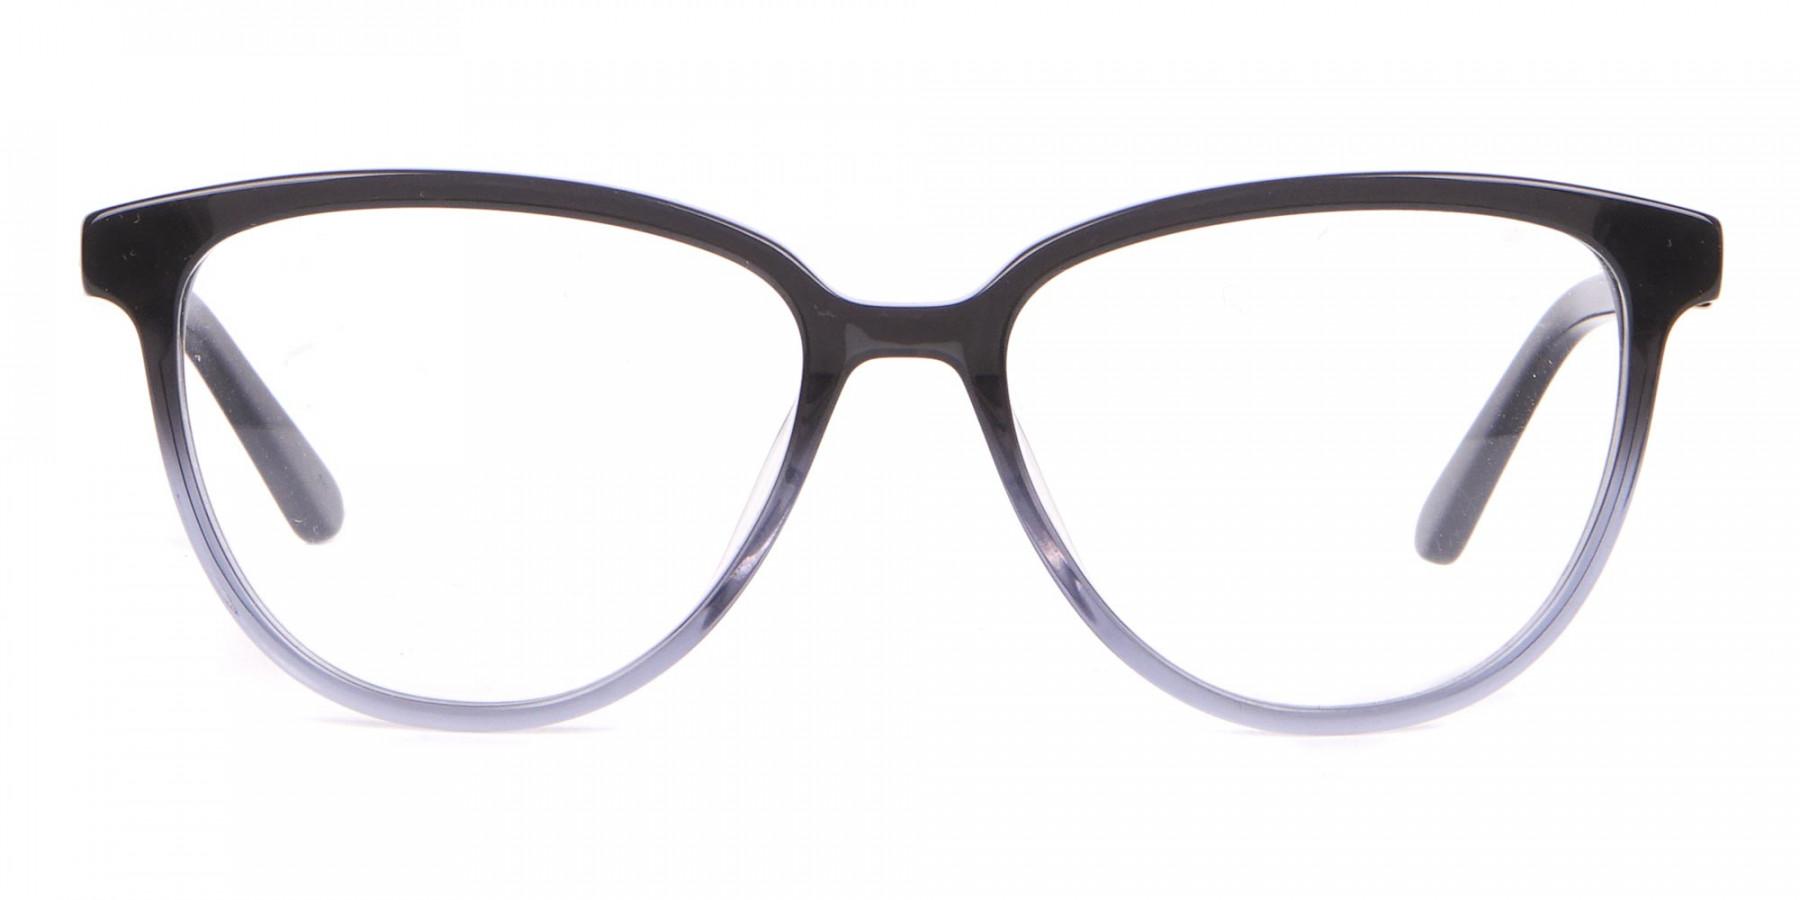 Calvin Klein CK18514 Women Cateye Glasses In Black Crystal-1